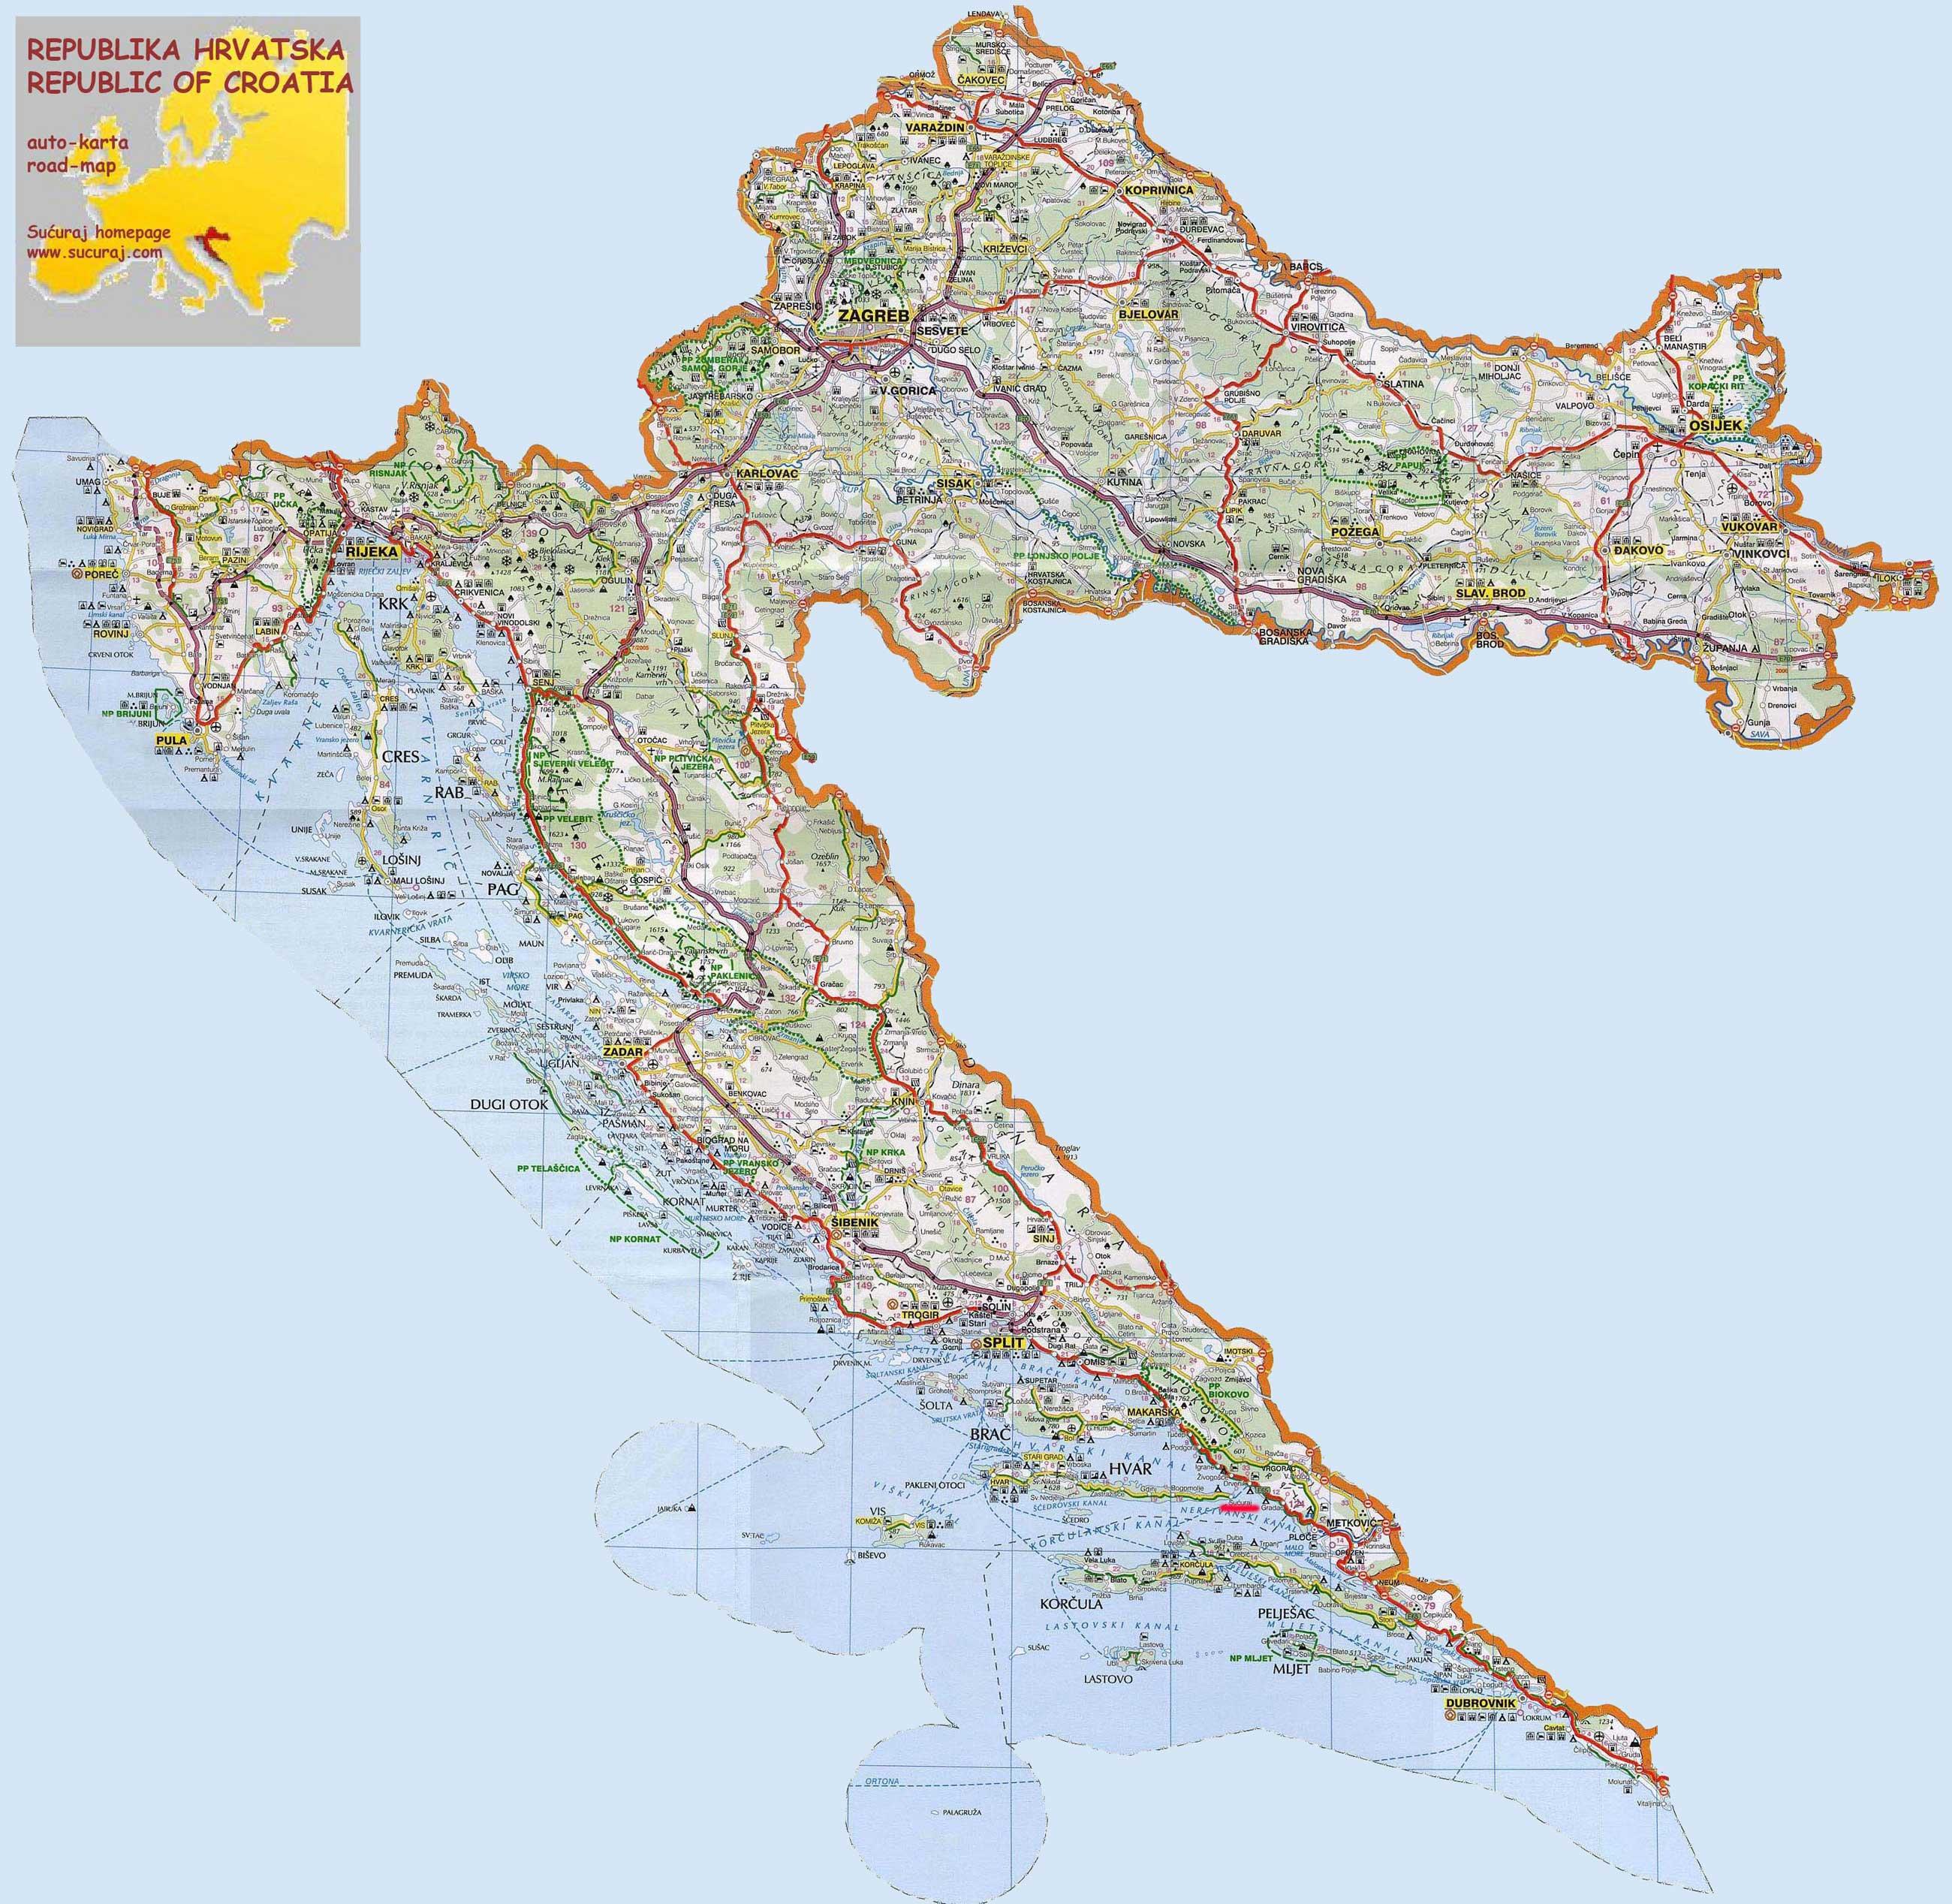 хорватия на карте мира фото салатах, закусках, сэндвичах